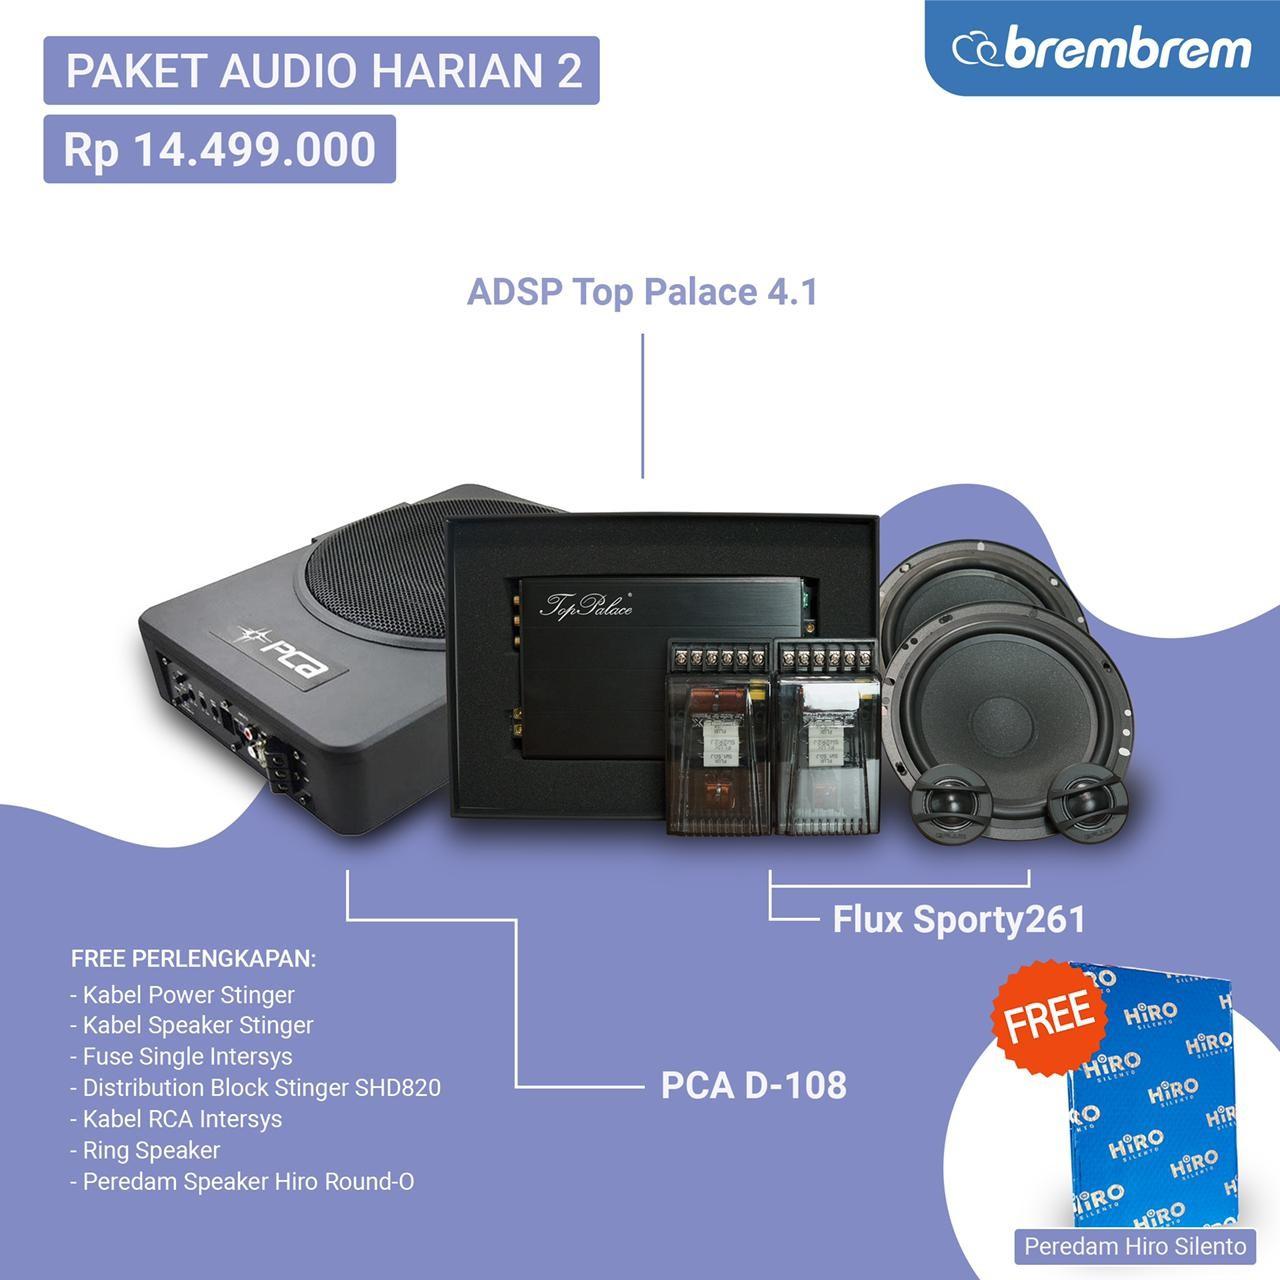 PAKET AUDIO HARIAN 2 - PROMO MENANG BANYAK